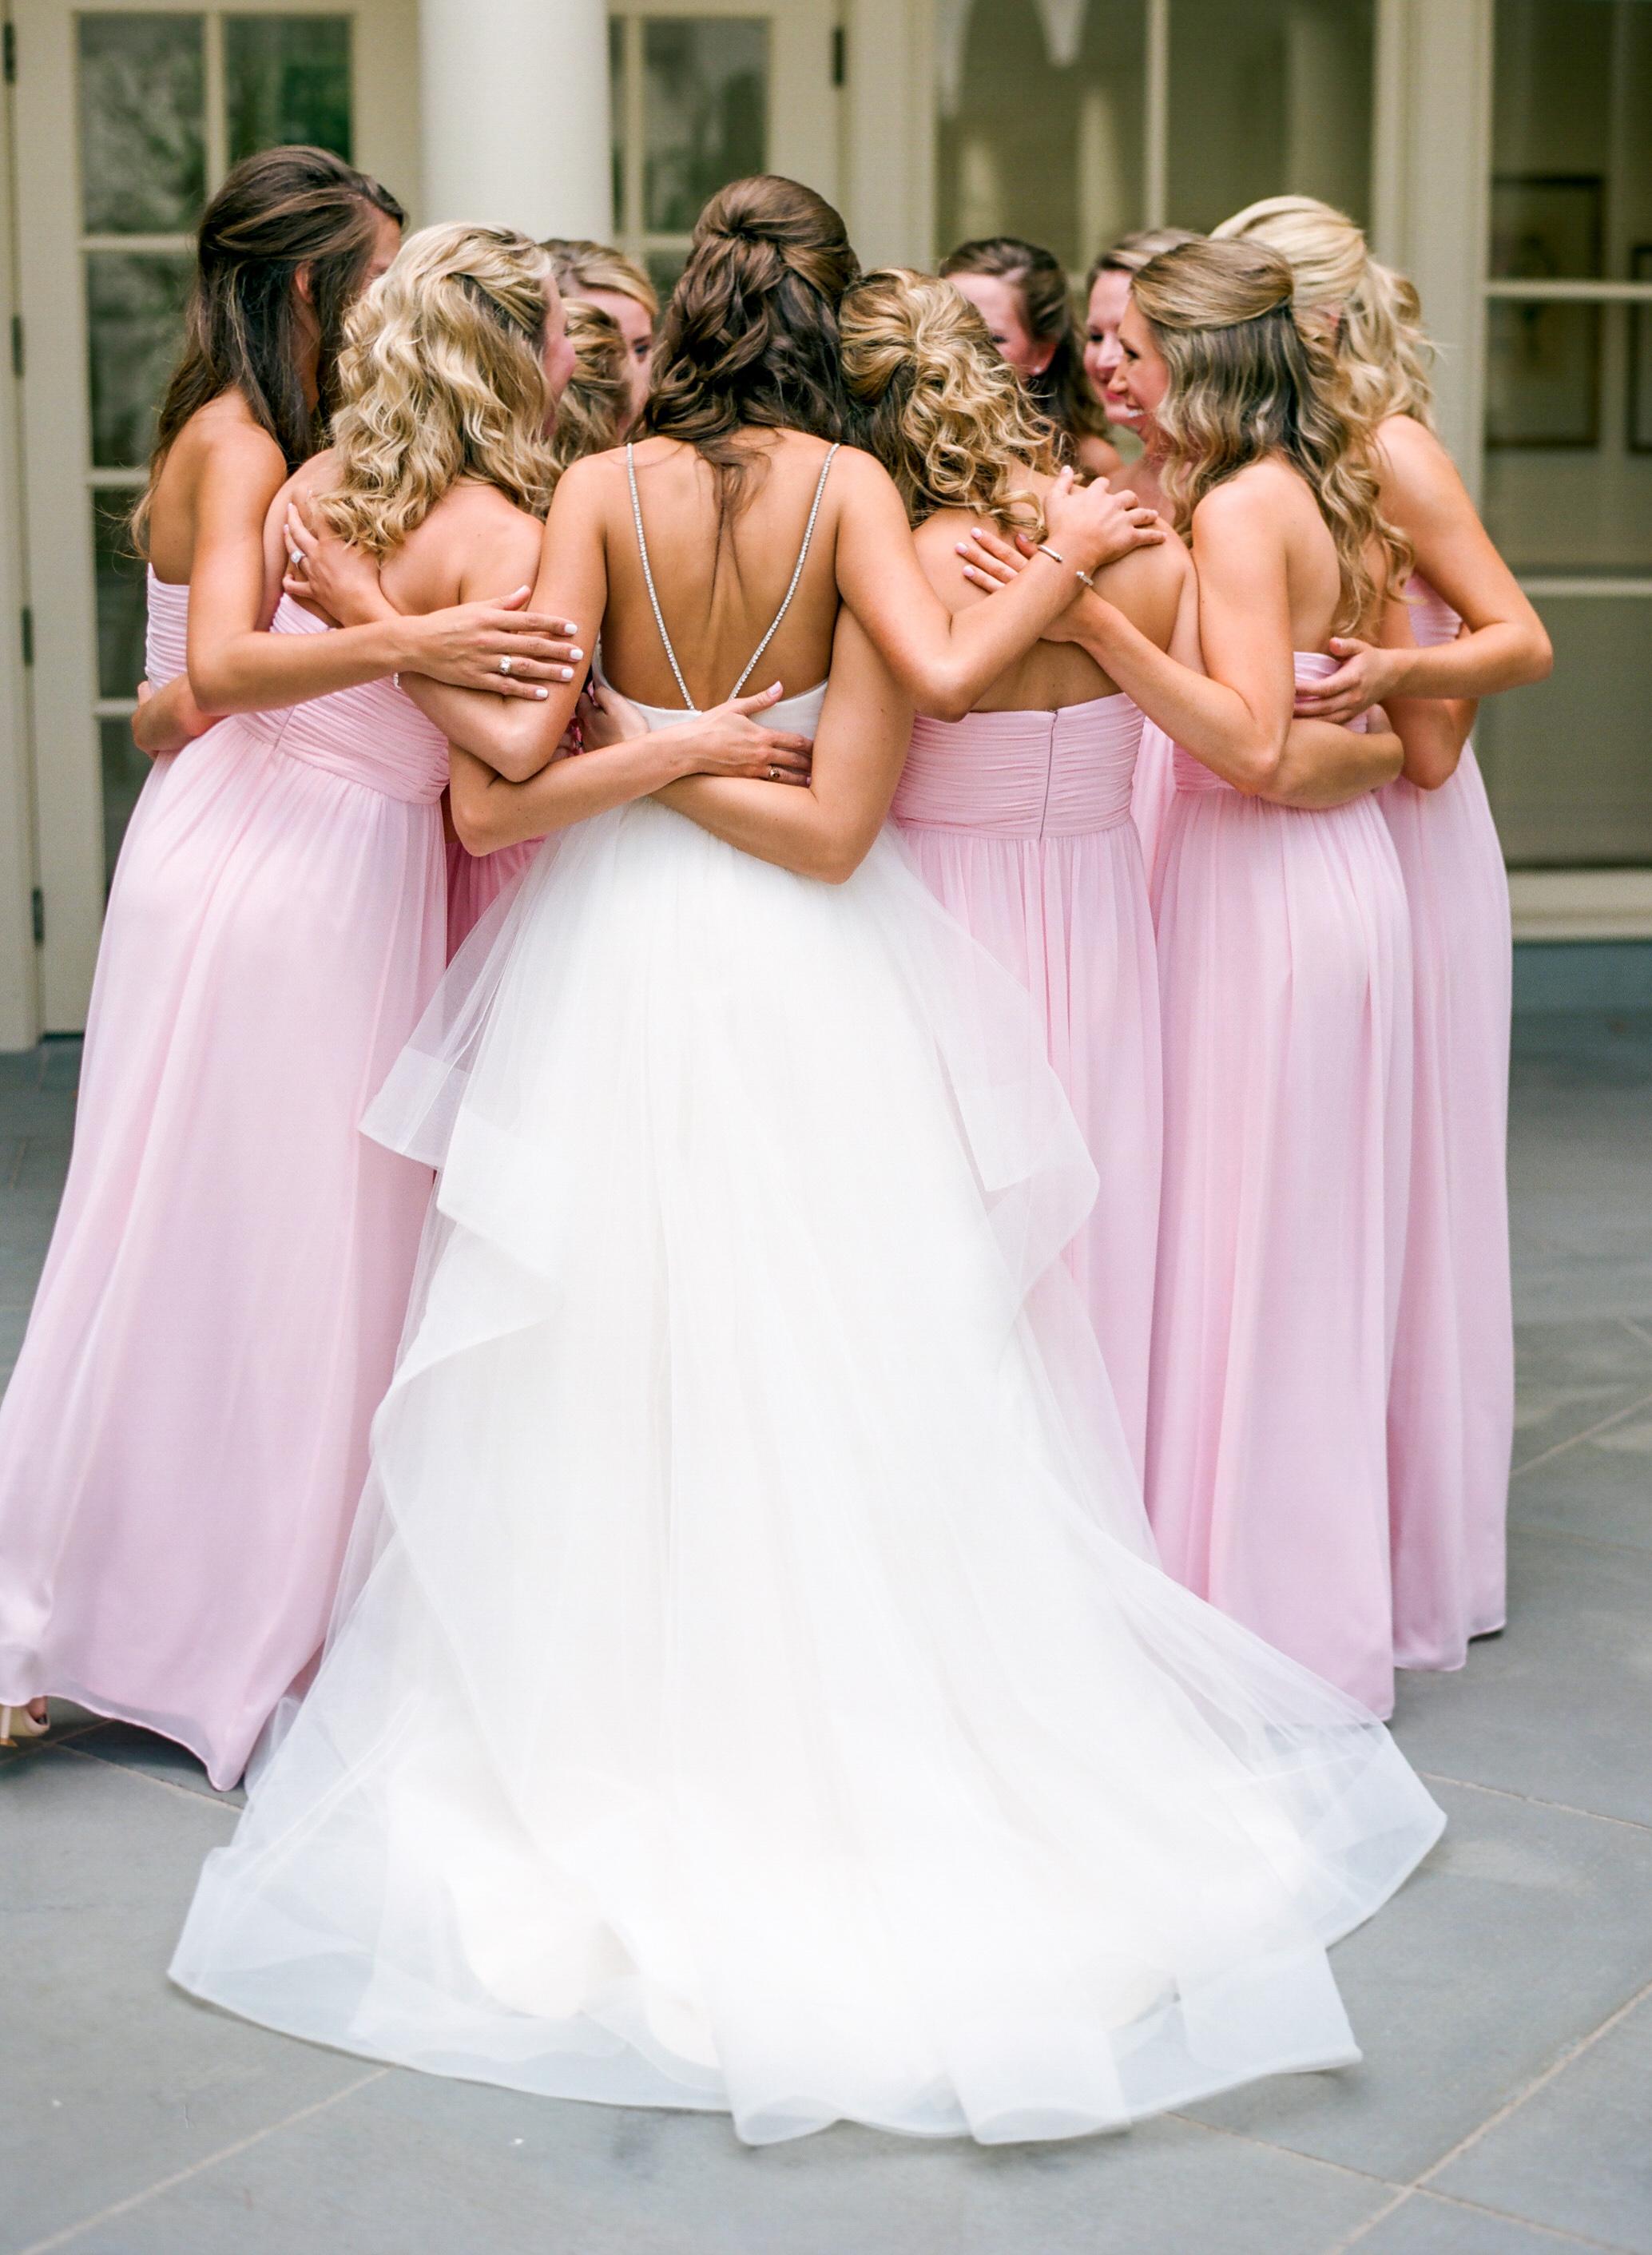 Dana-Fernandez-Photography-Weddings-in-Houston-Magazine-feature-Houston-wedding-photographer-film-10.jpg